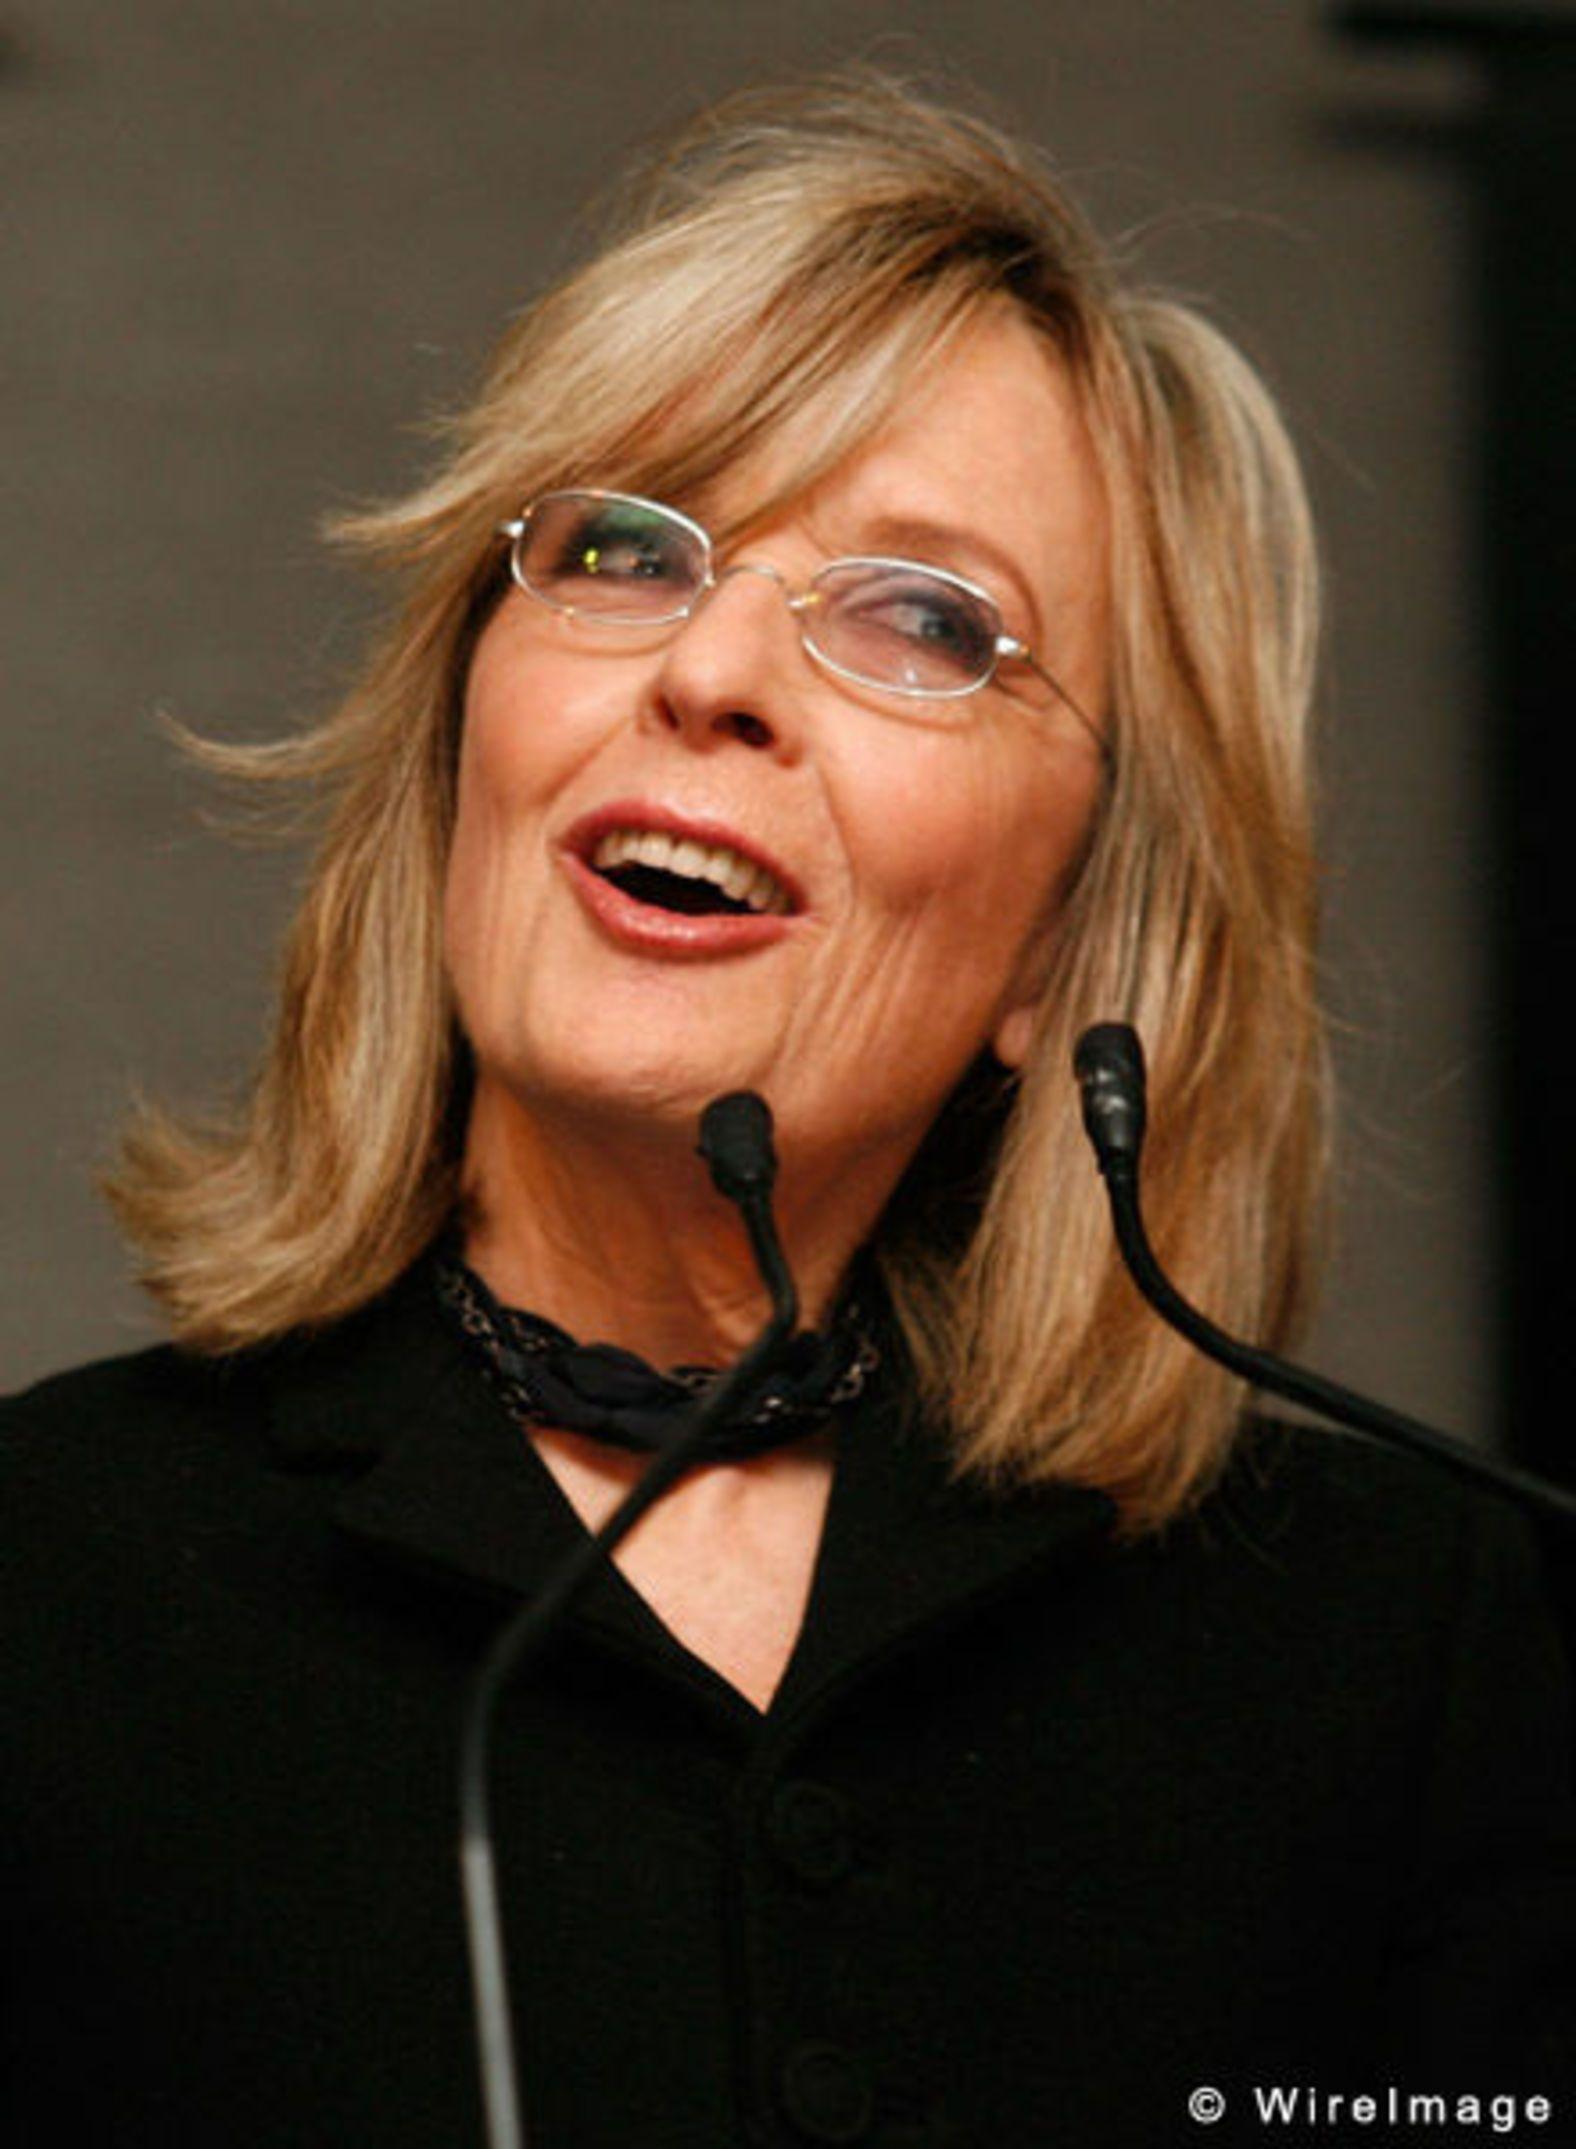 Diane Keaton love her Diane Keaton